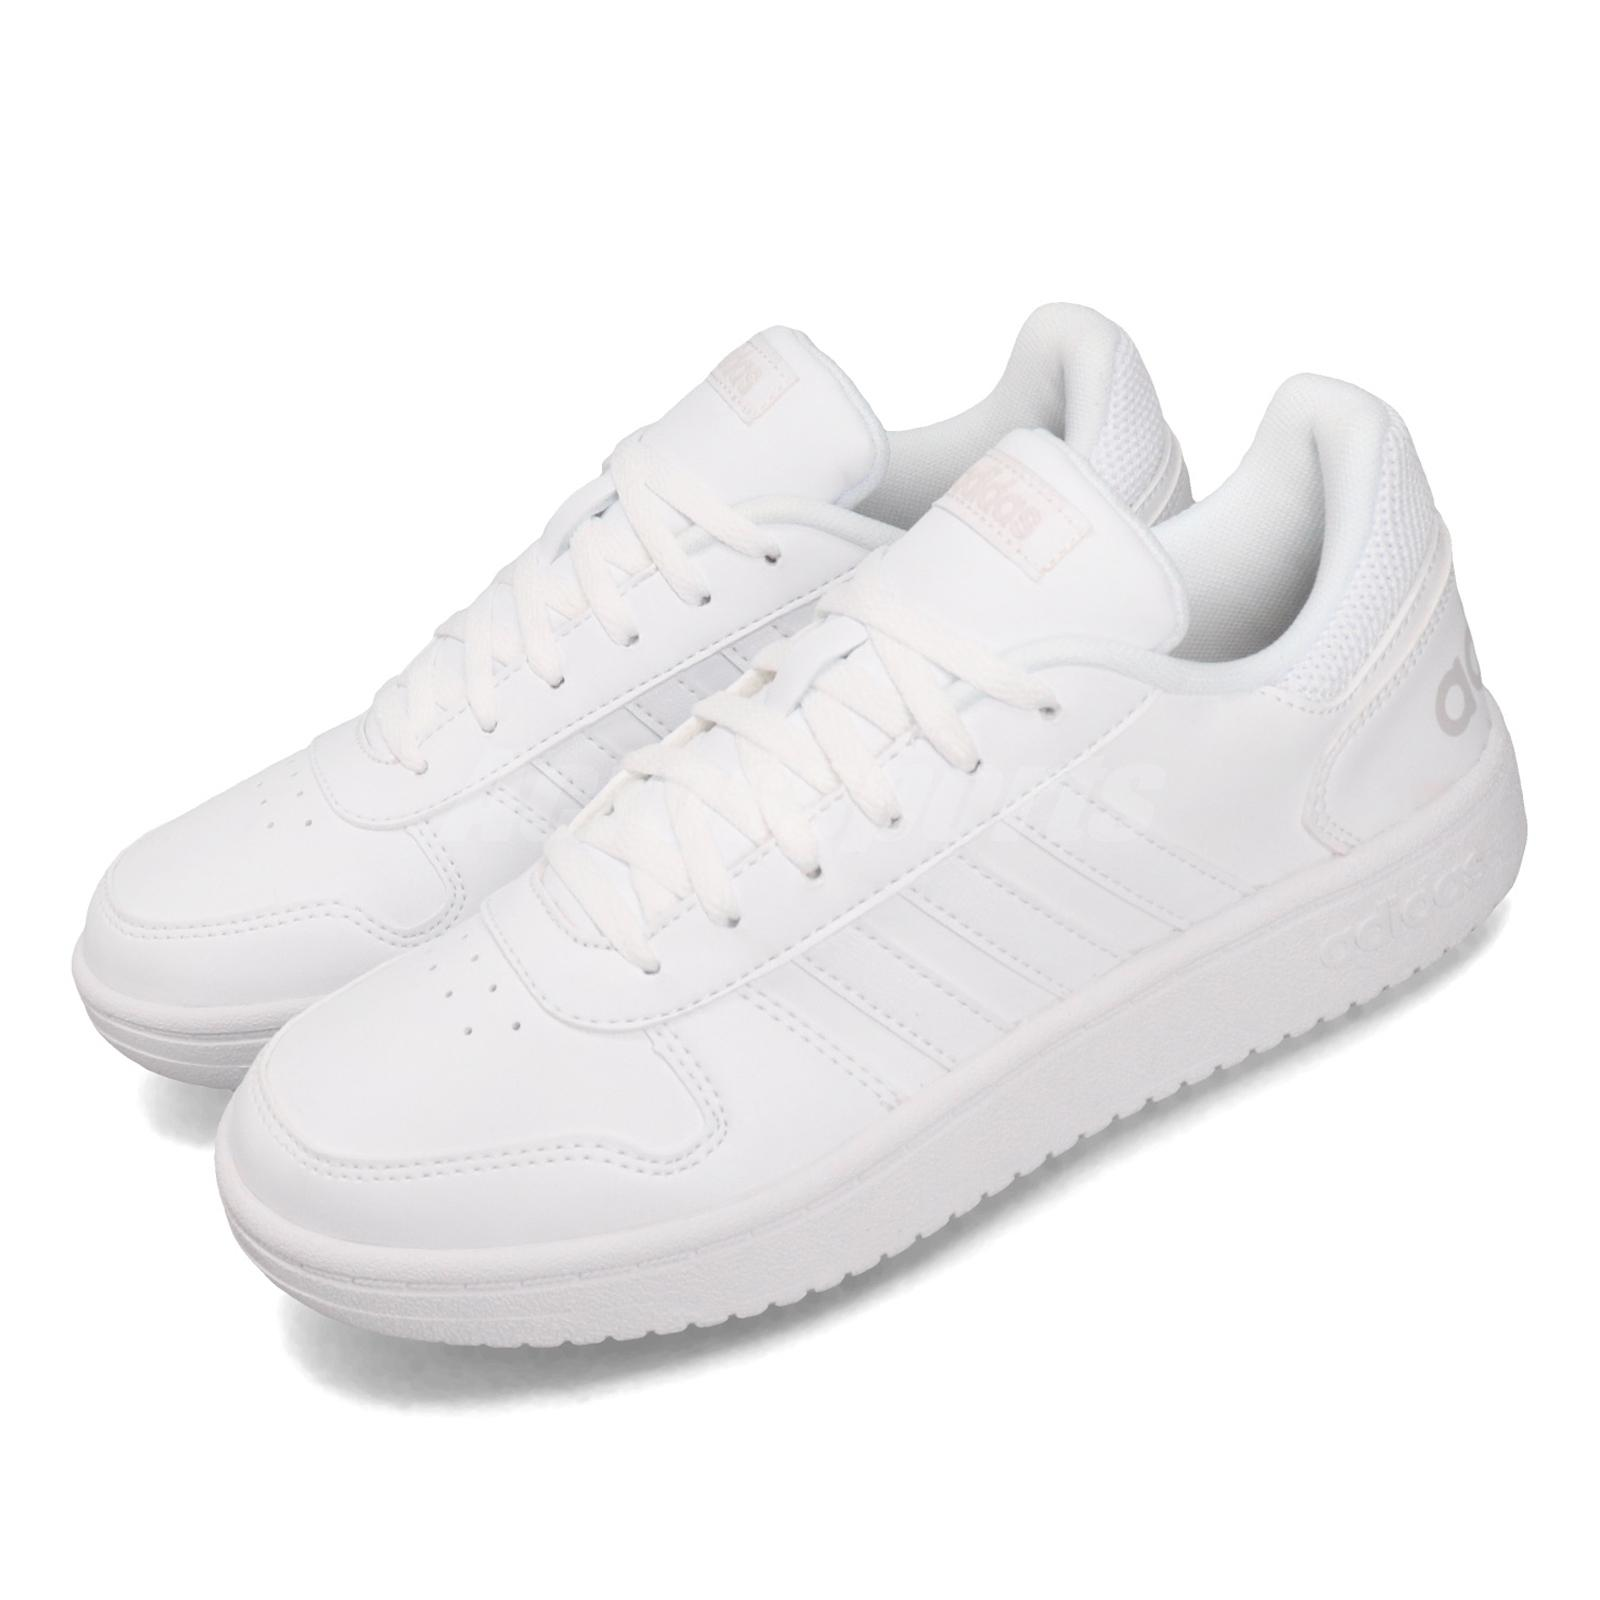 adidas Hoops 2.0 White Grey Women